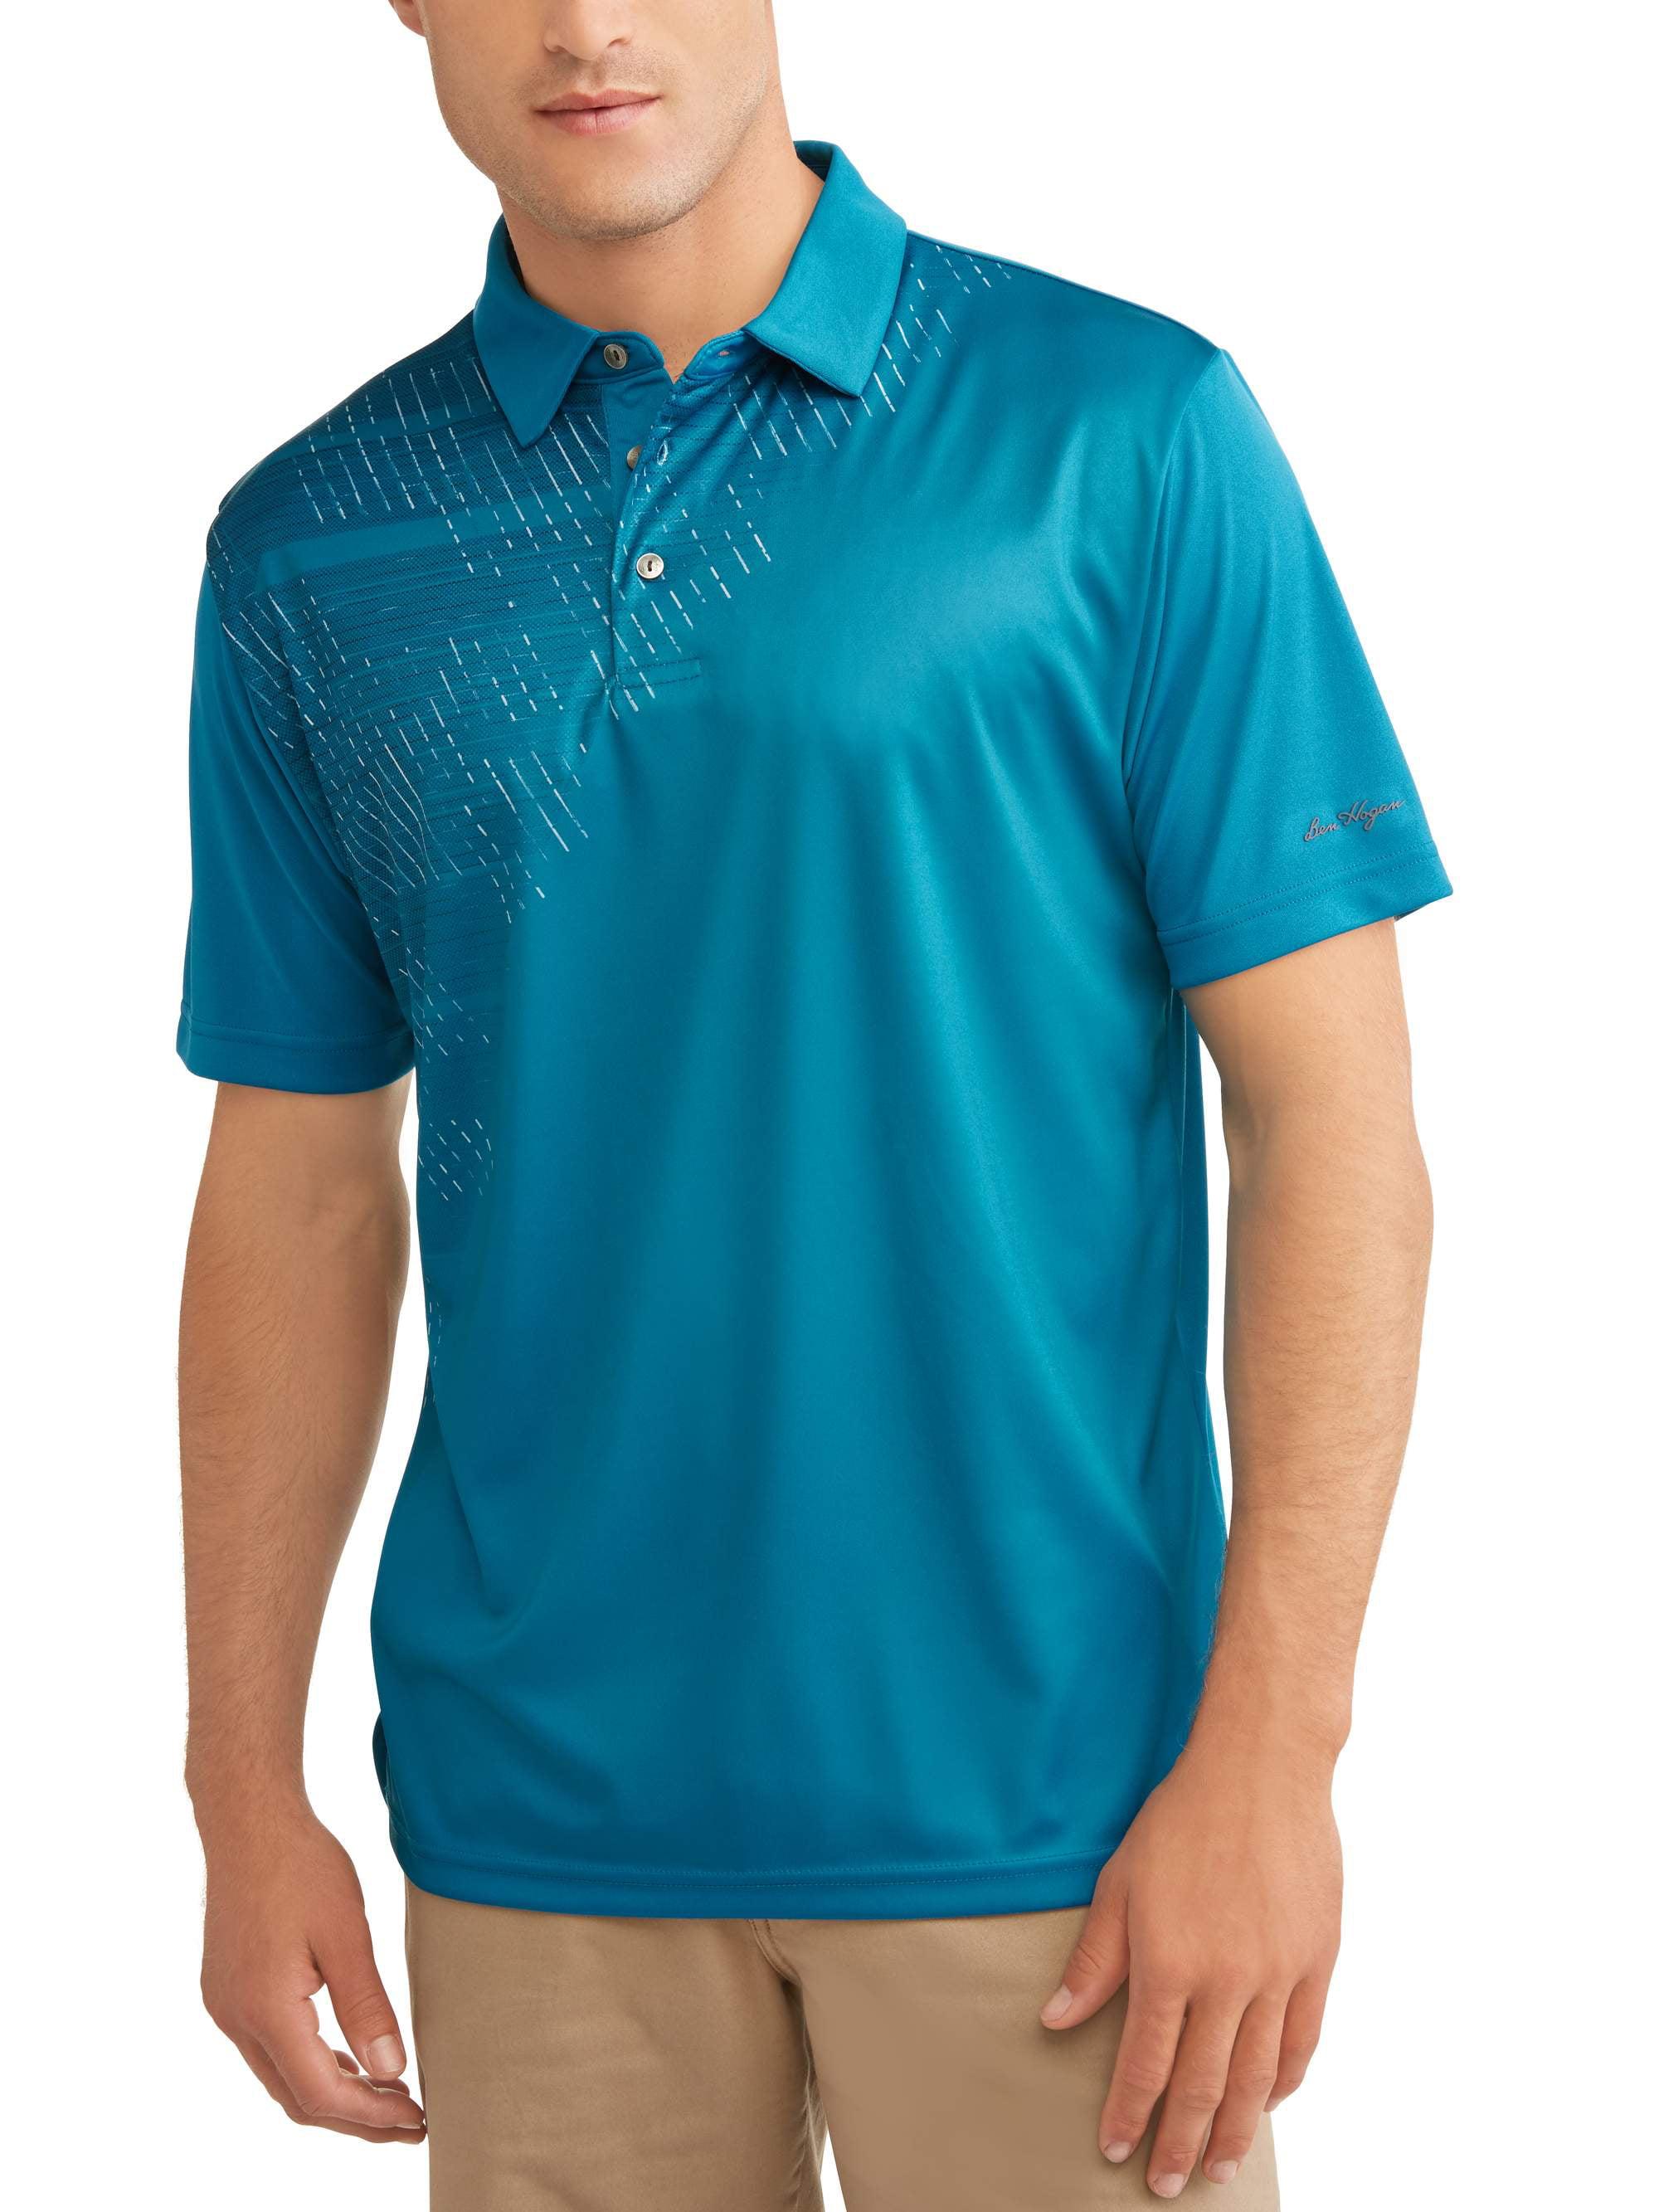 Ben Hogan Mens Performance Short Sleeve Printed Polo Shirt Up To